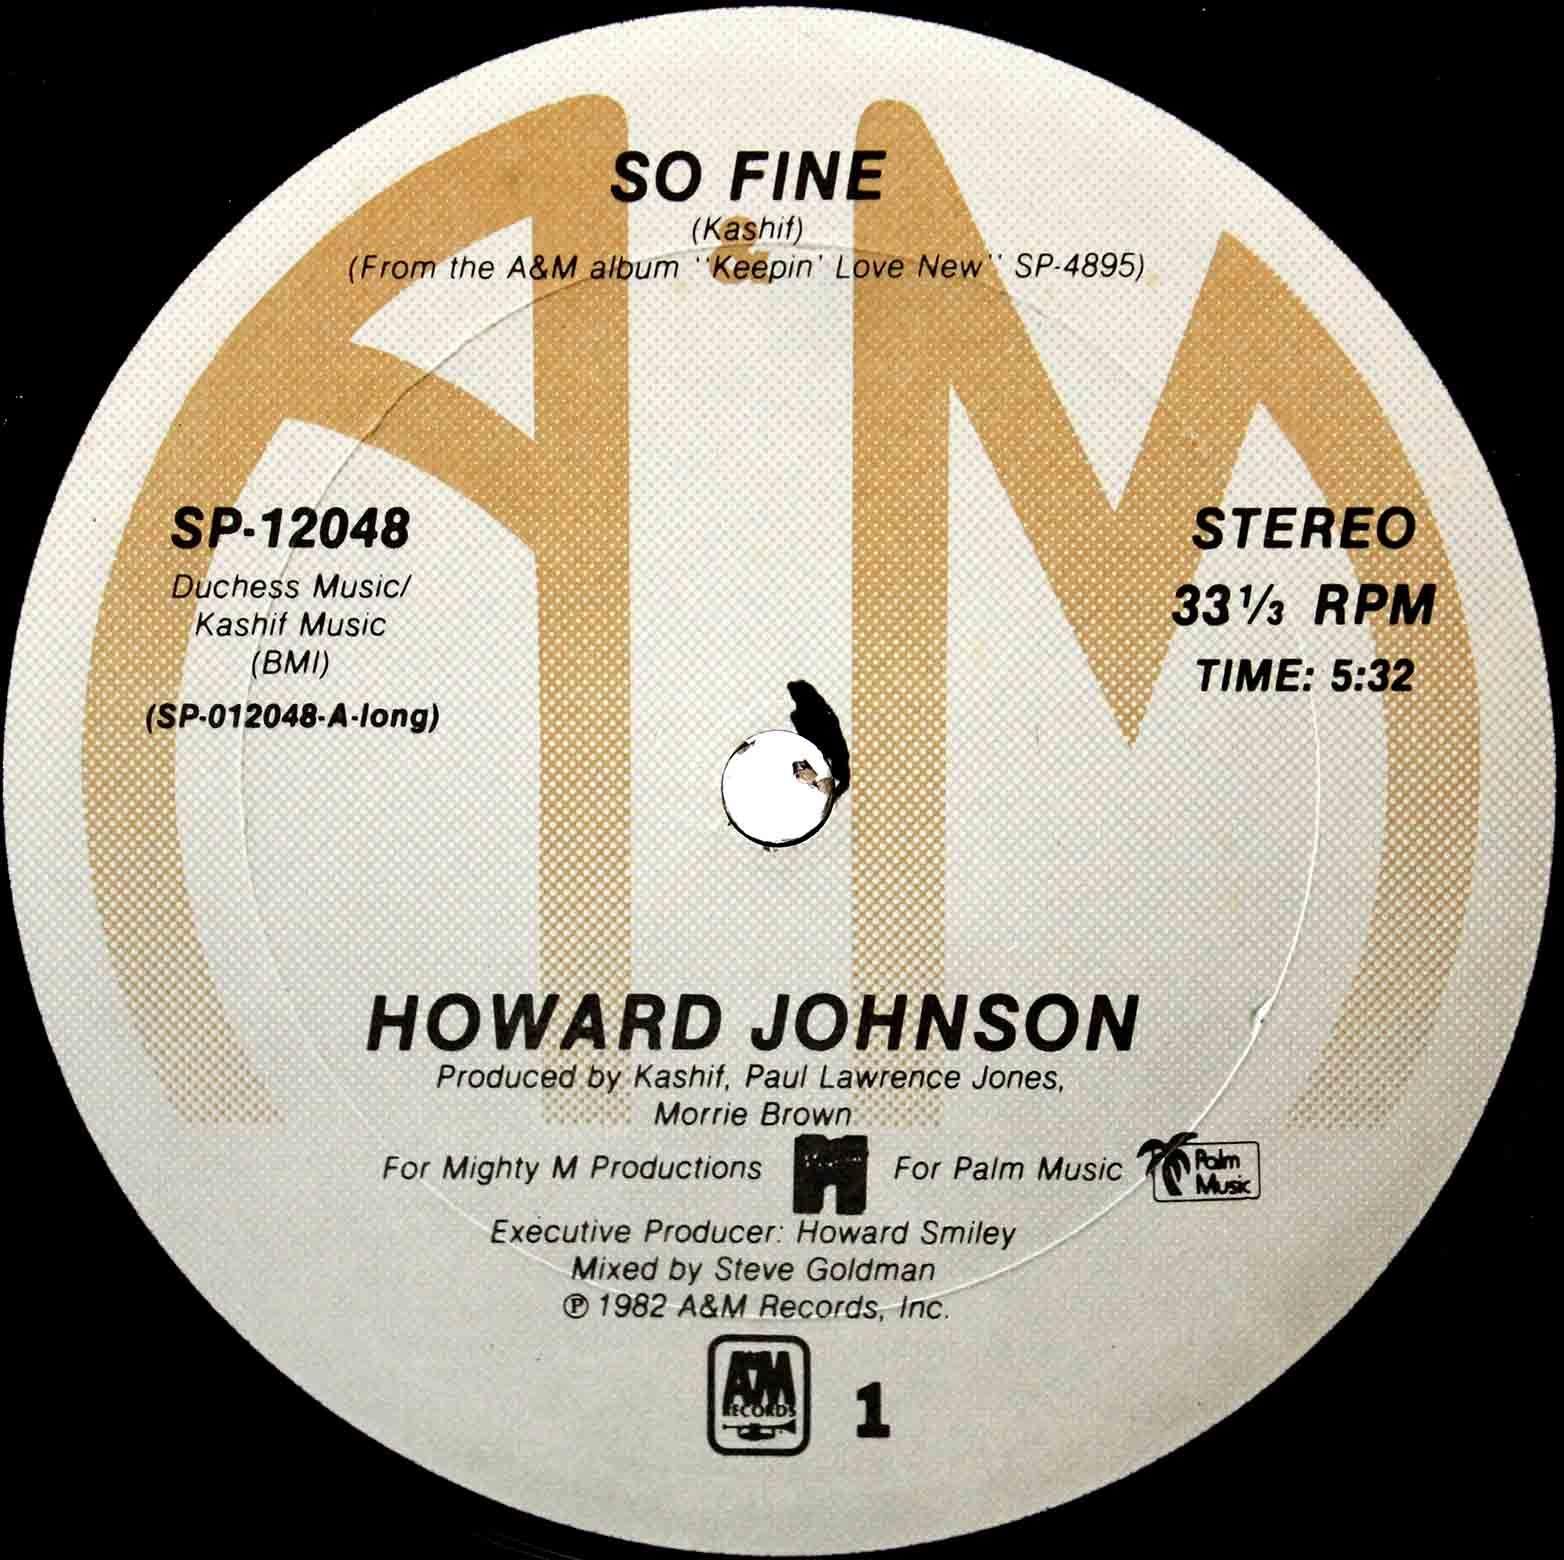 Howard Johnson - So Fine 03